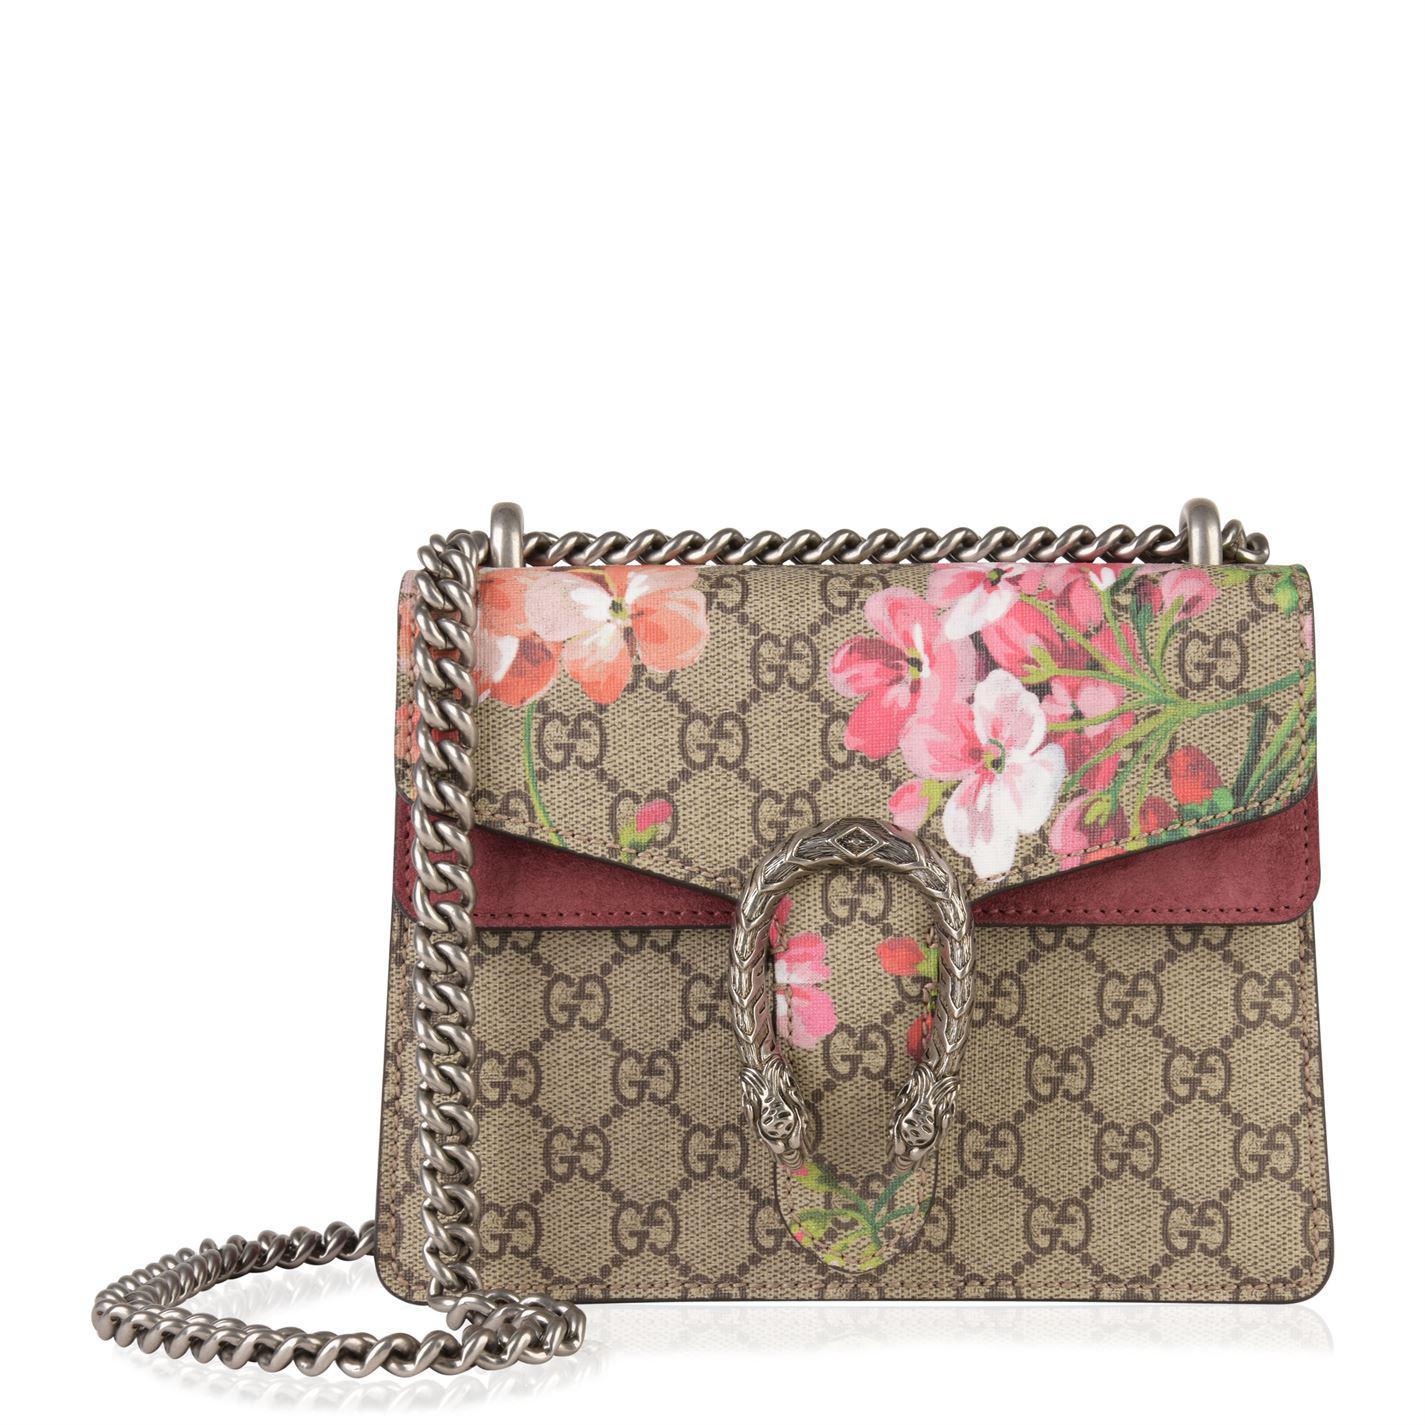 30c04b7a950 Lyst - Gucci Bloom Dionysus Bag in Natural